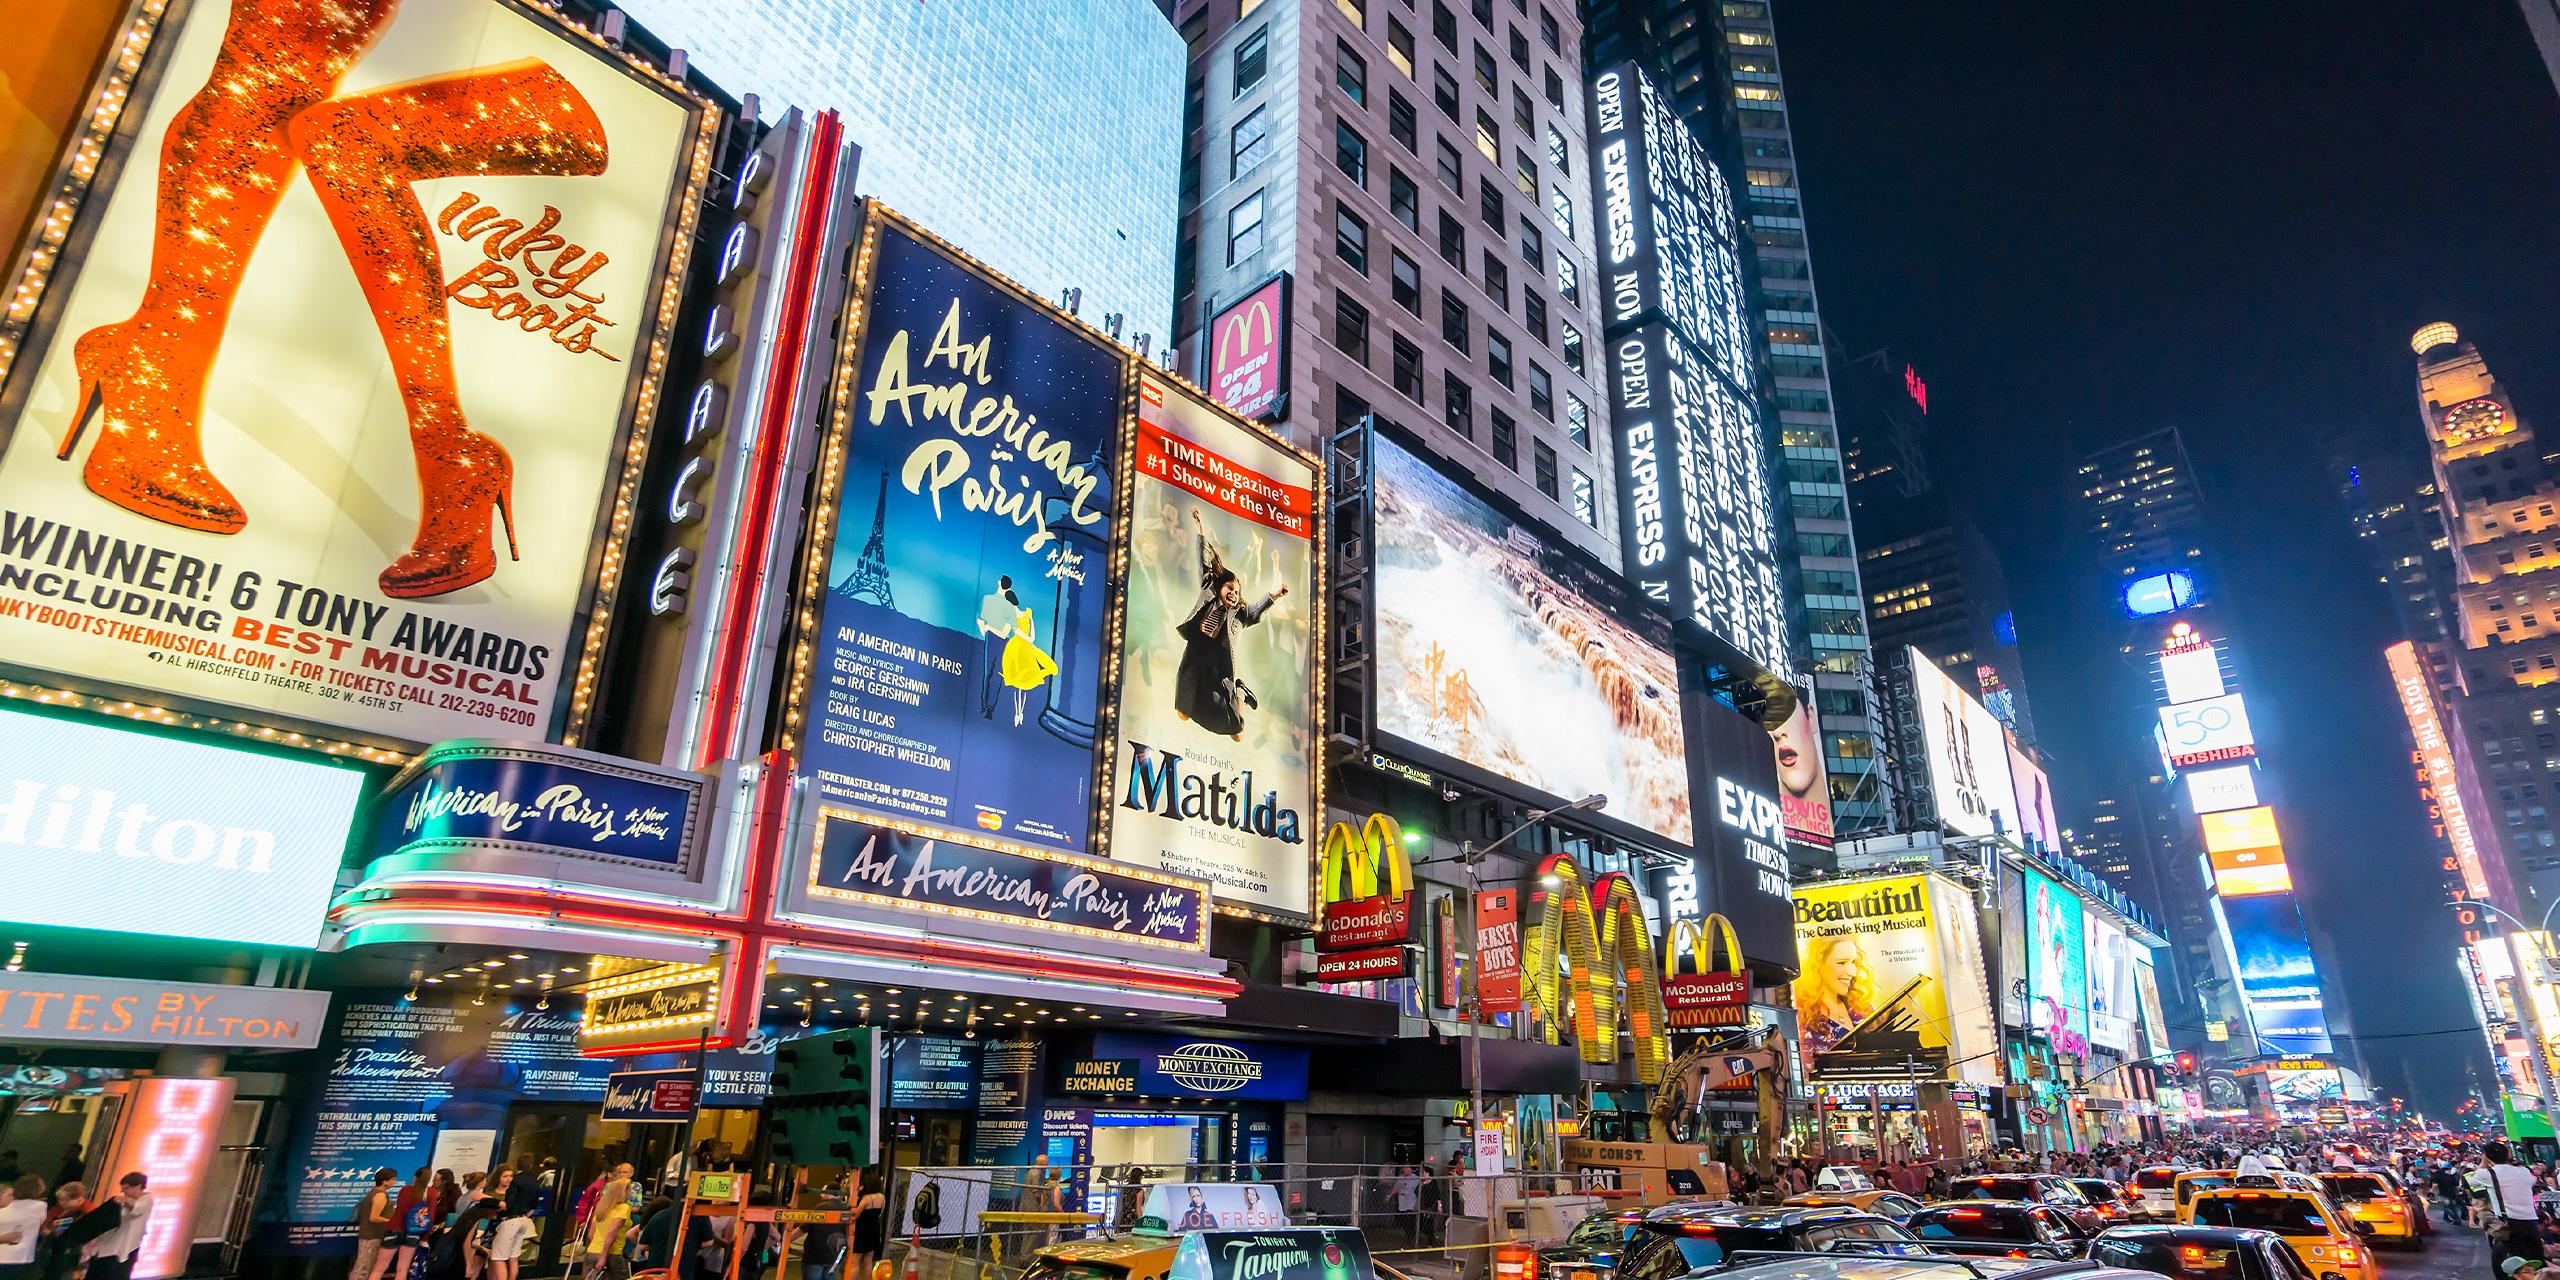 broadway musicals new york city